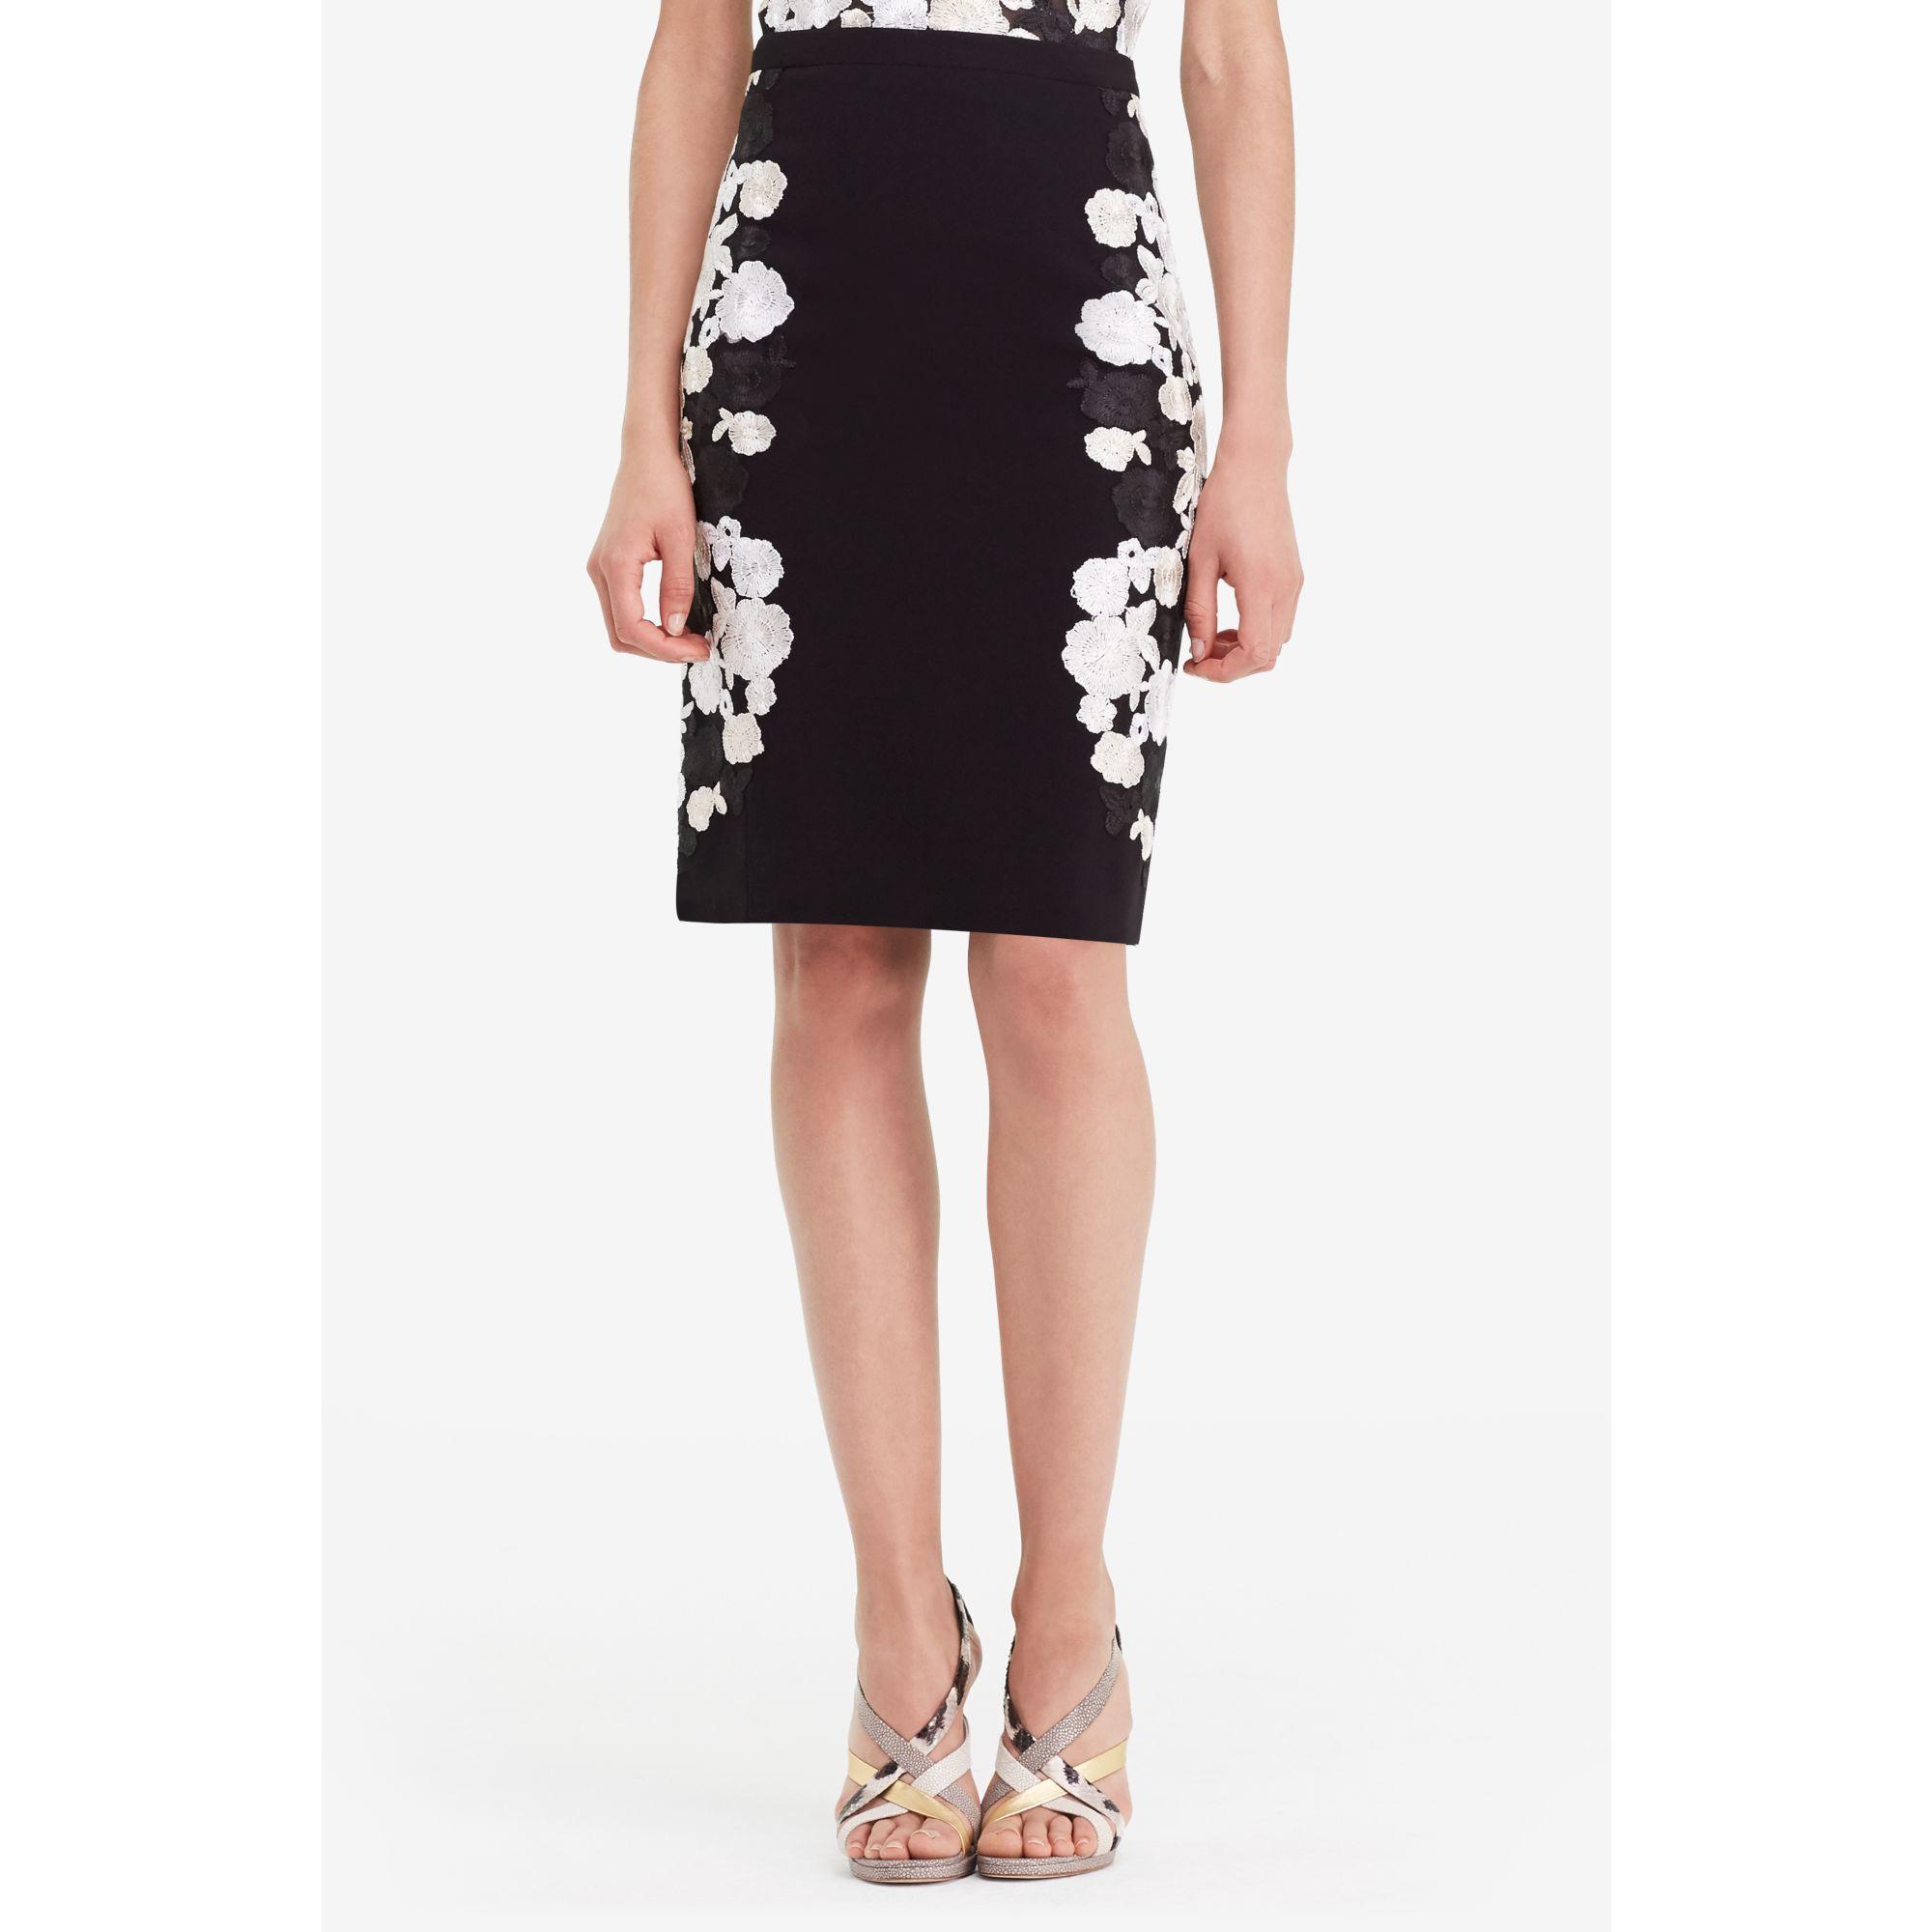 floral pencil skirt - photo #48